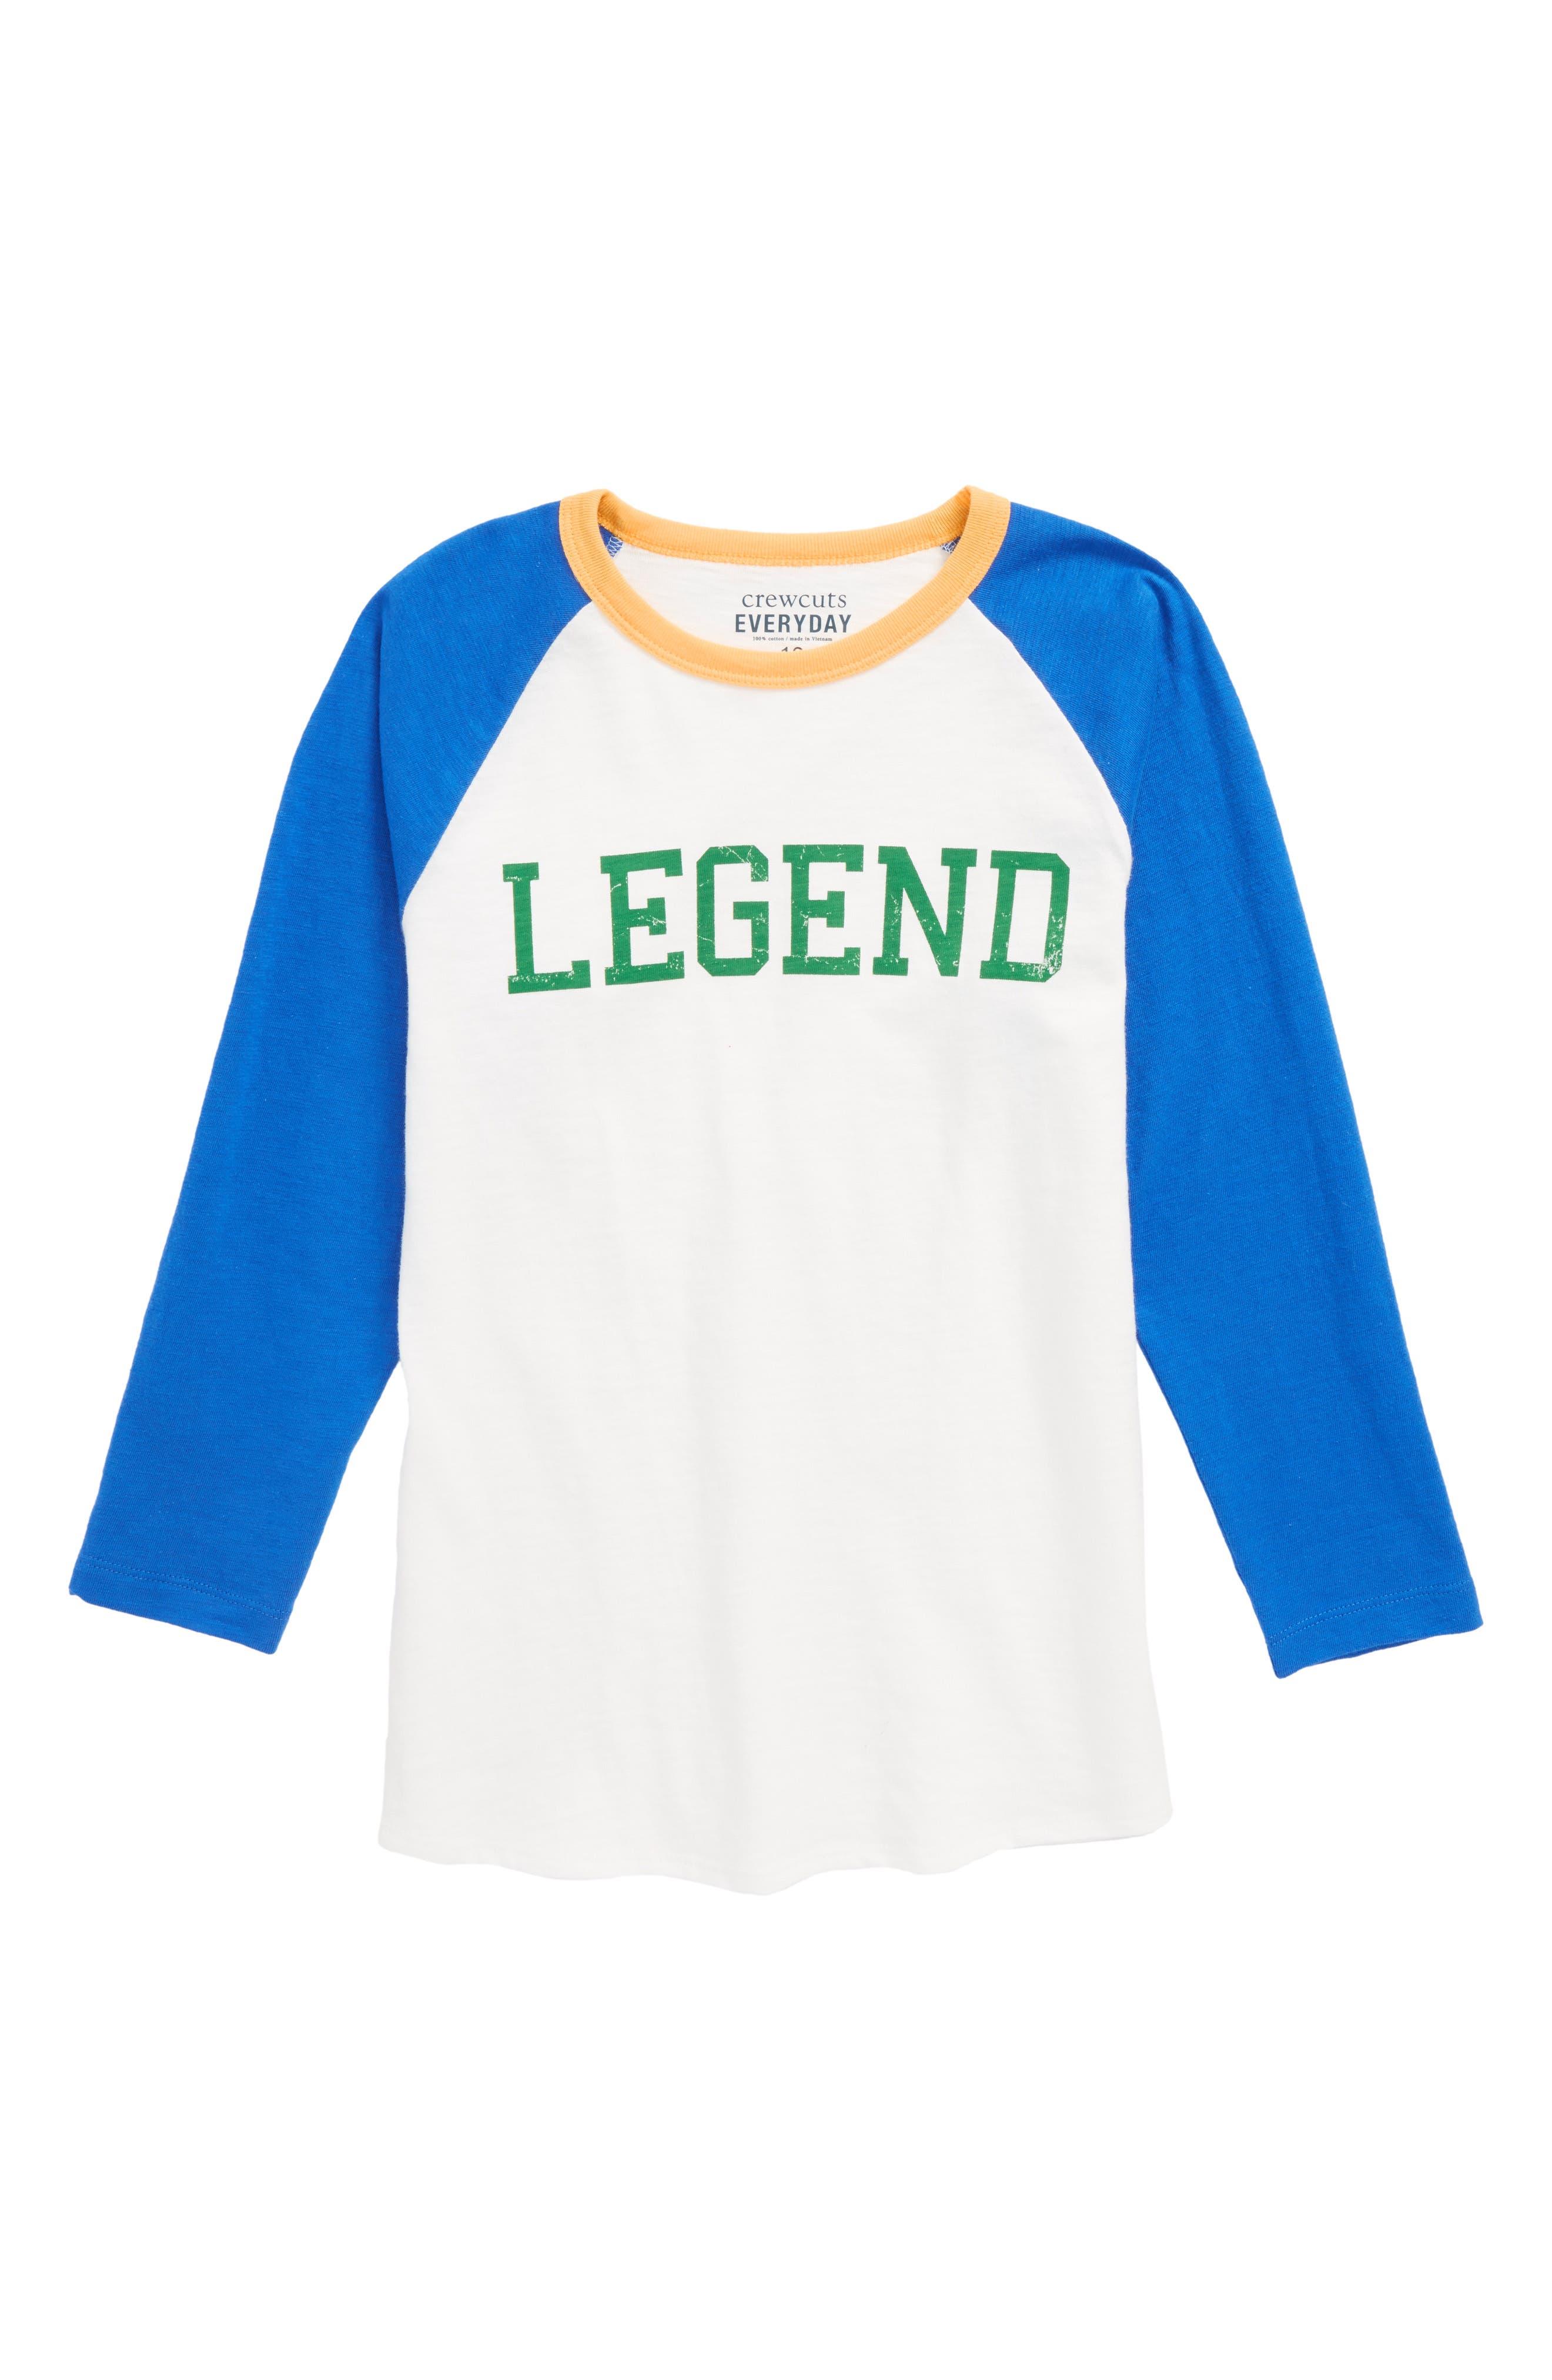 Legend Baseball T-Shirt,                             Main thumbnail 1, color,                             900